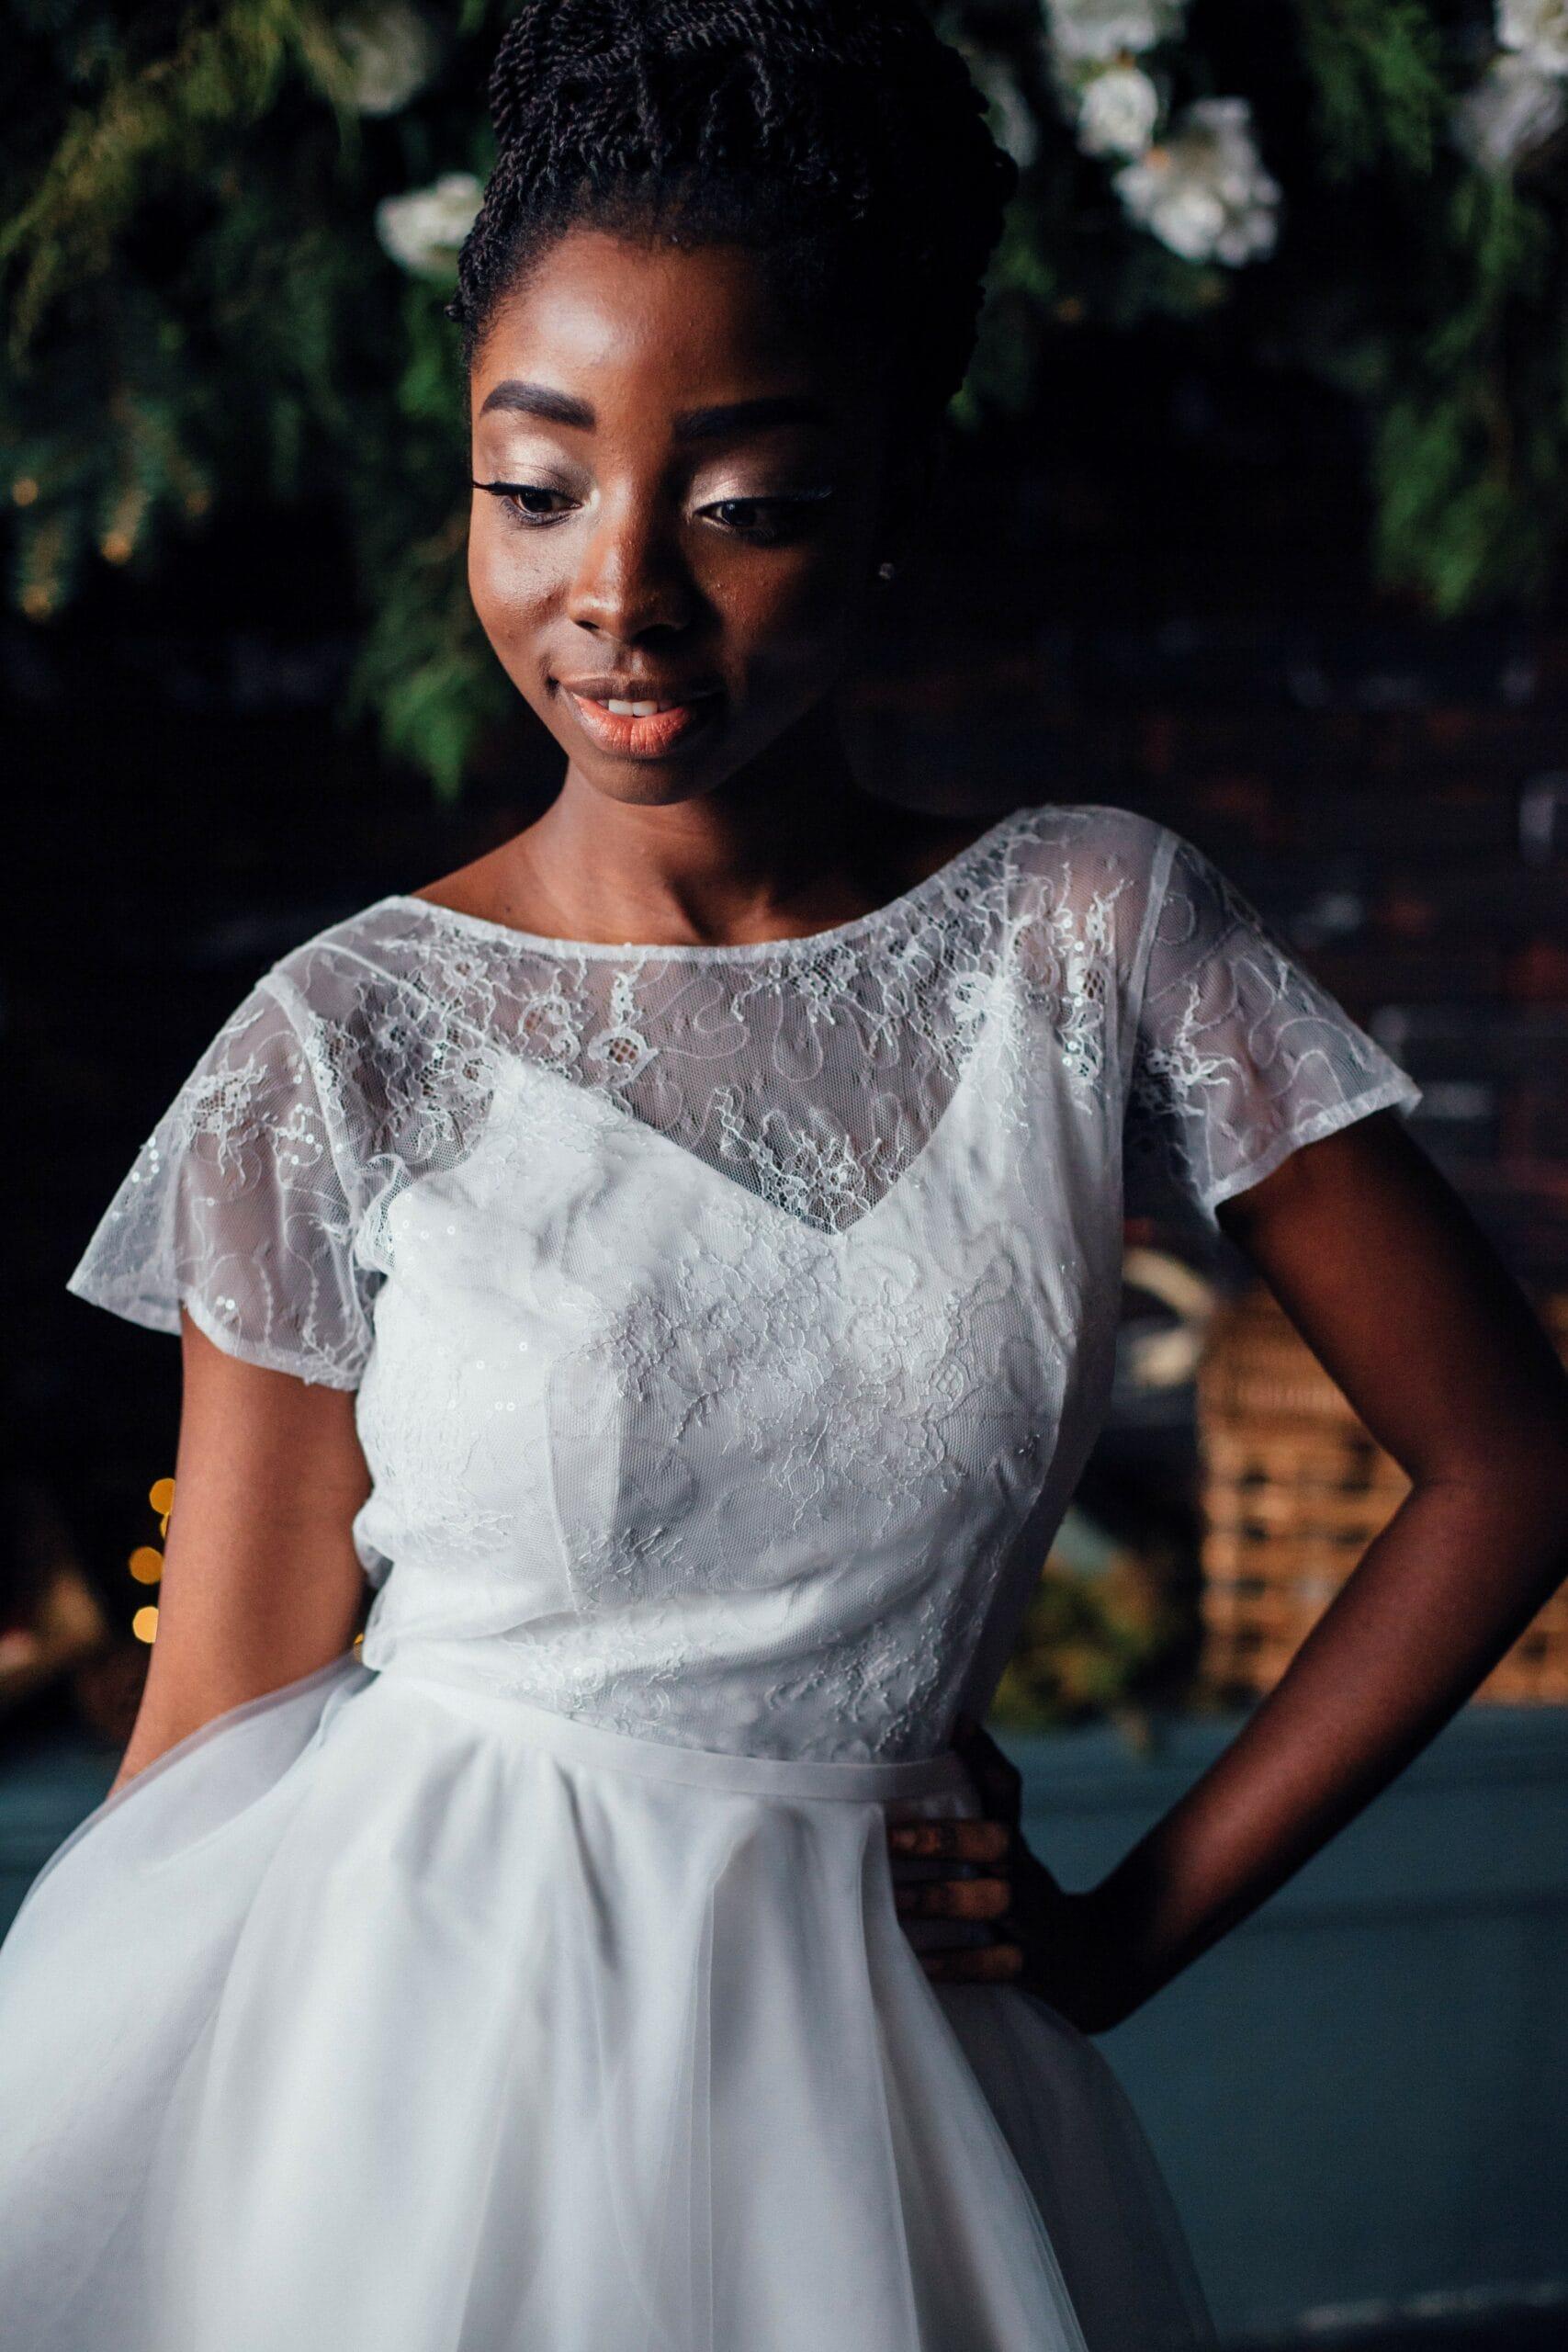 Свадебное платье MELANIE, коллекция THE ABSOLUTE LOVE, бренд RARE BRIDAL, фото 1